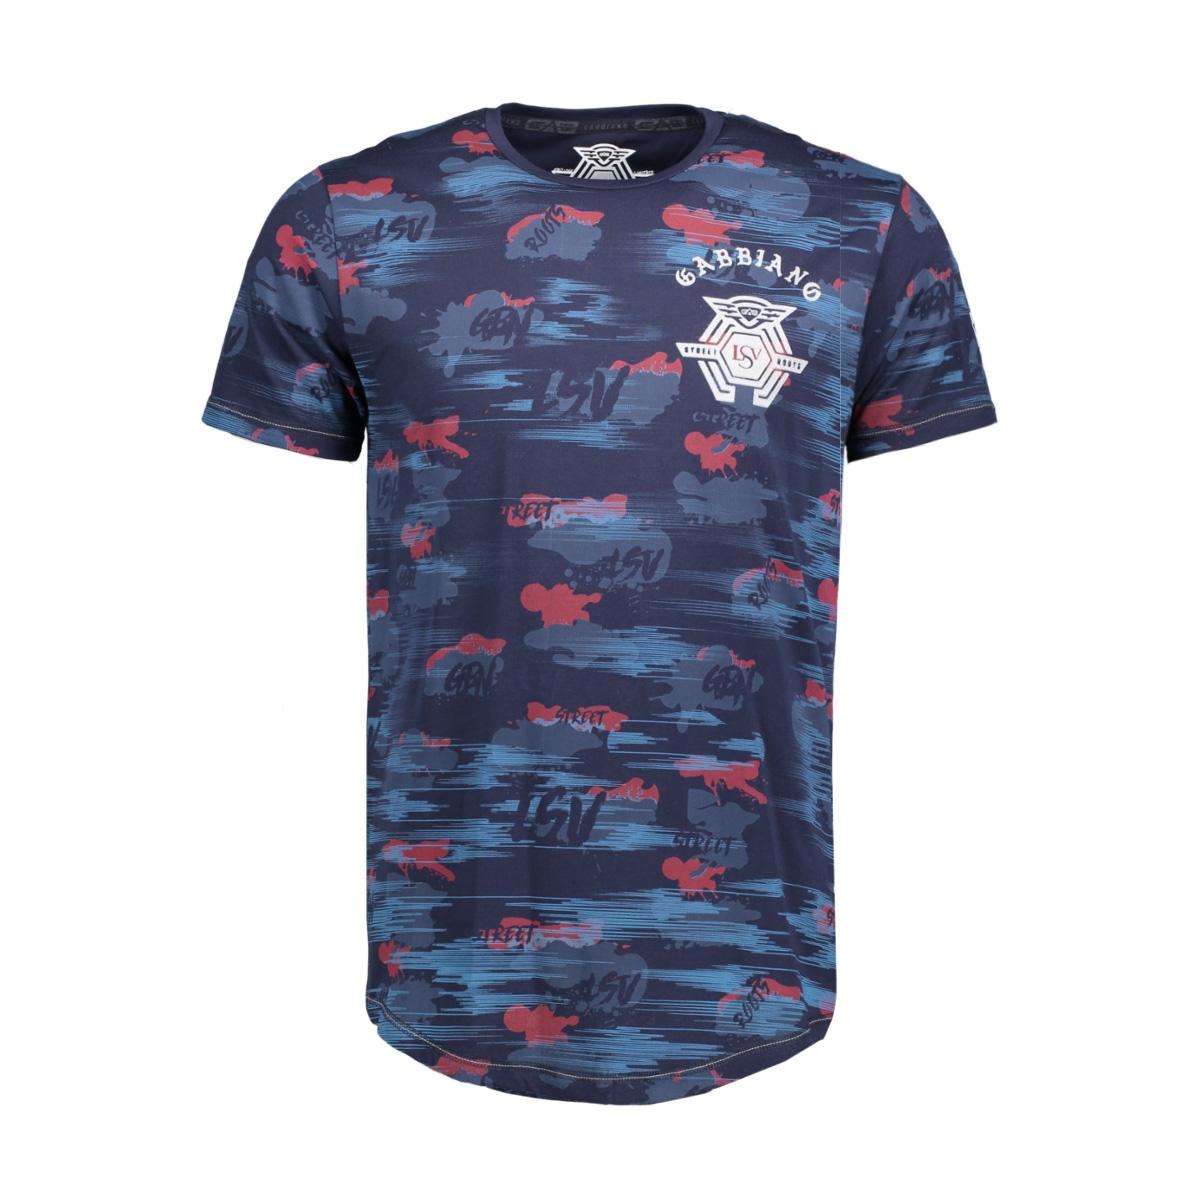 13862 gabbiano t-shirt navy